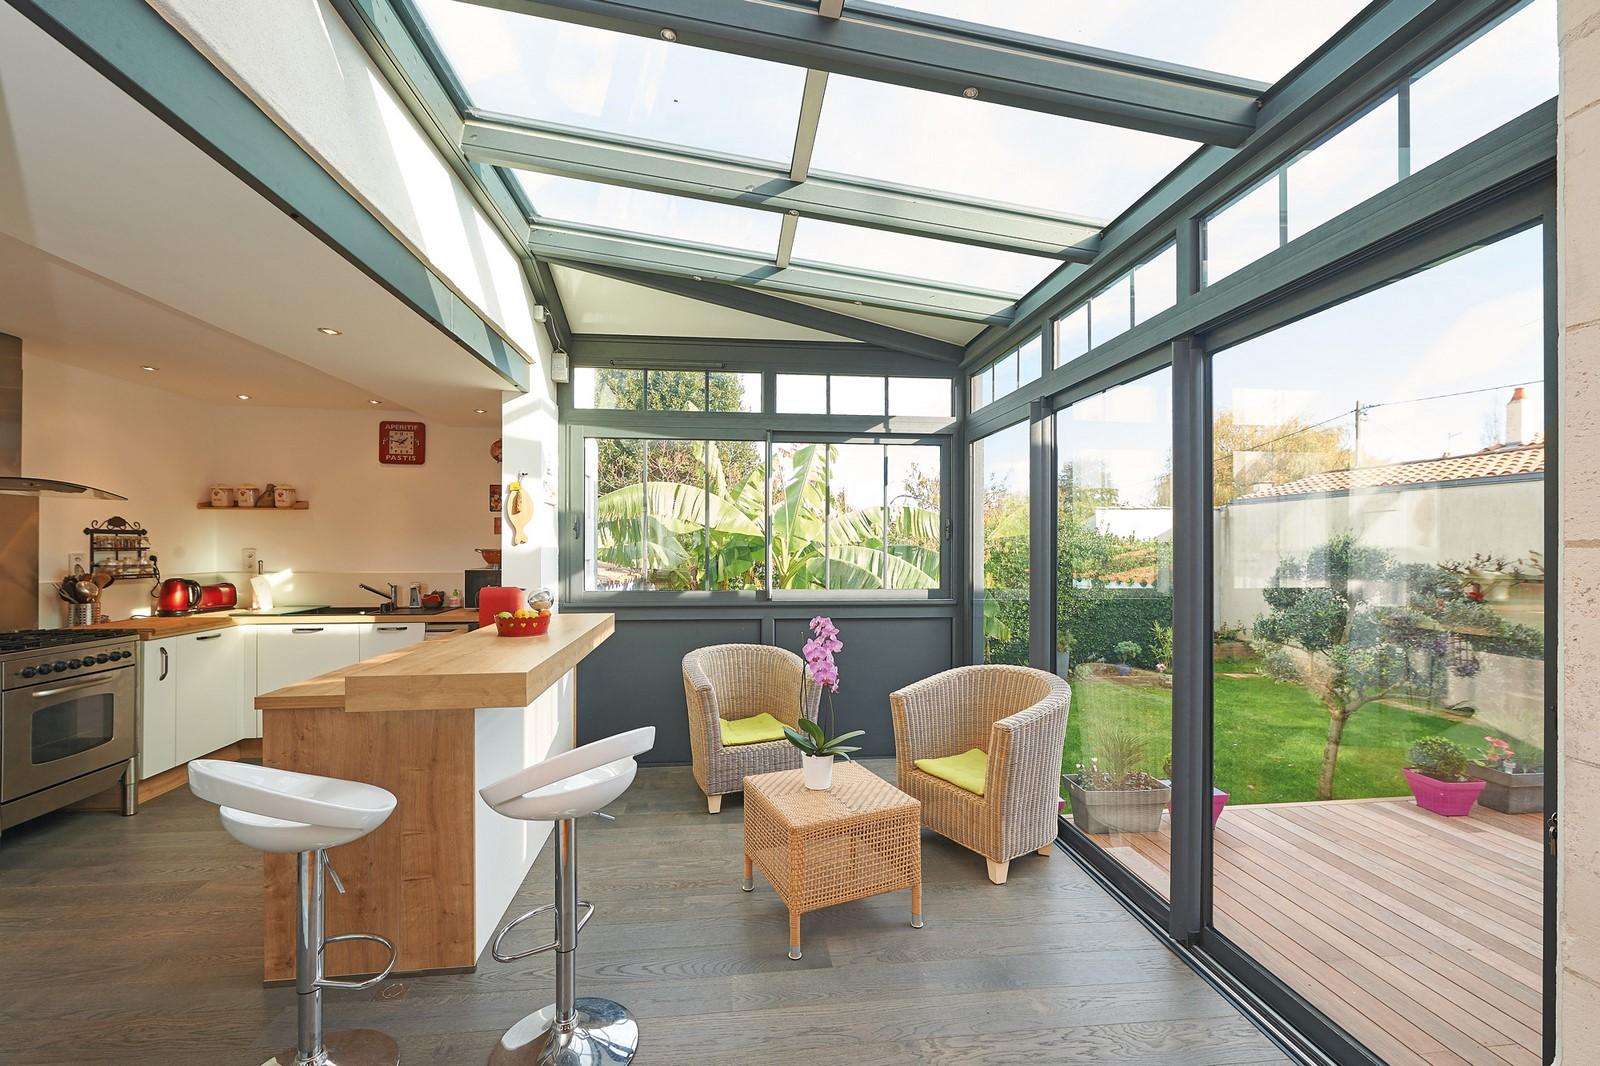 Cr ez votre espace cuisine avec ternois v randas for Veranda cuisine design